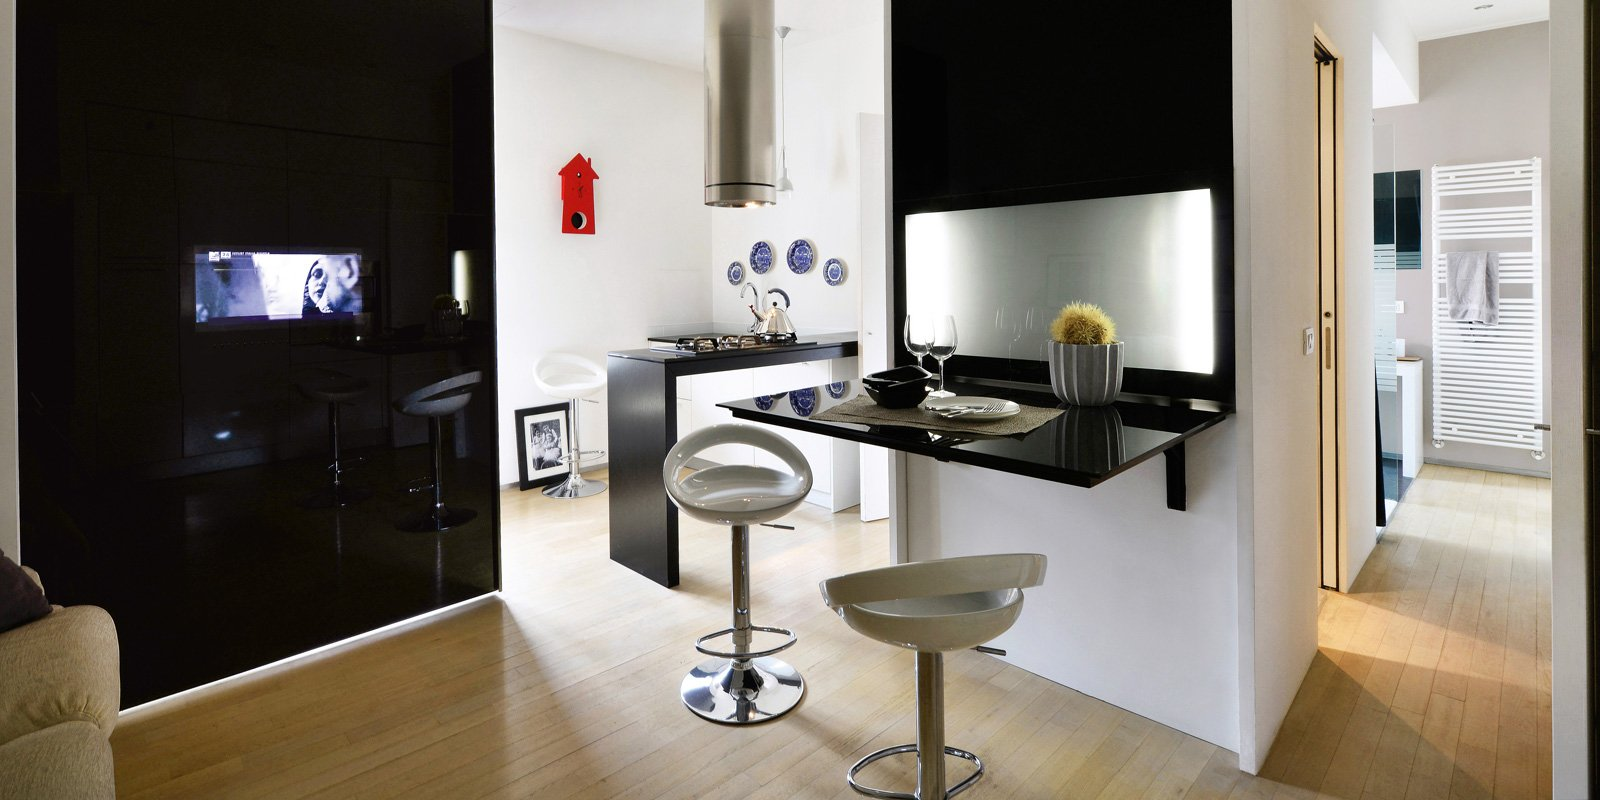 Bilocale black white 39 mq in stile minimal cose di casa - Arredare cucina 4 mq ...